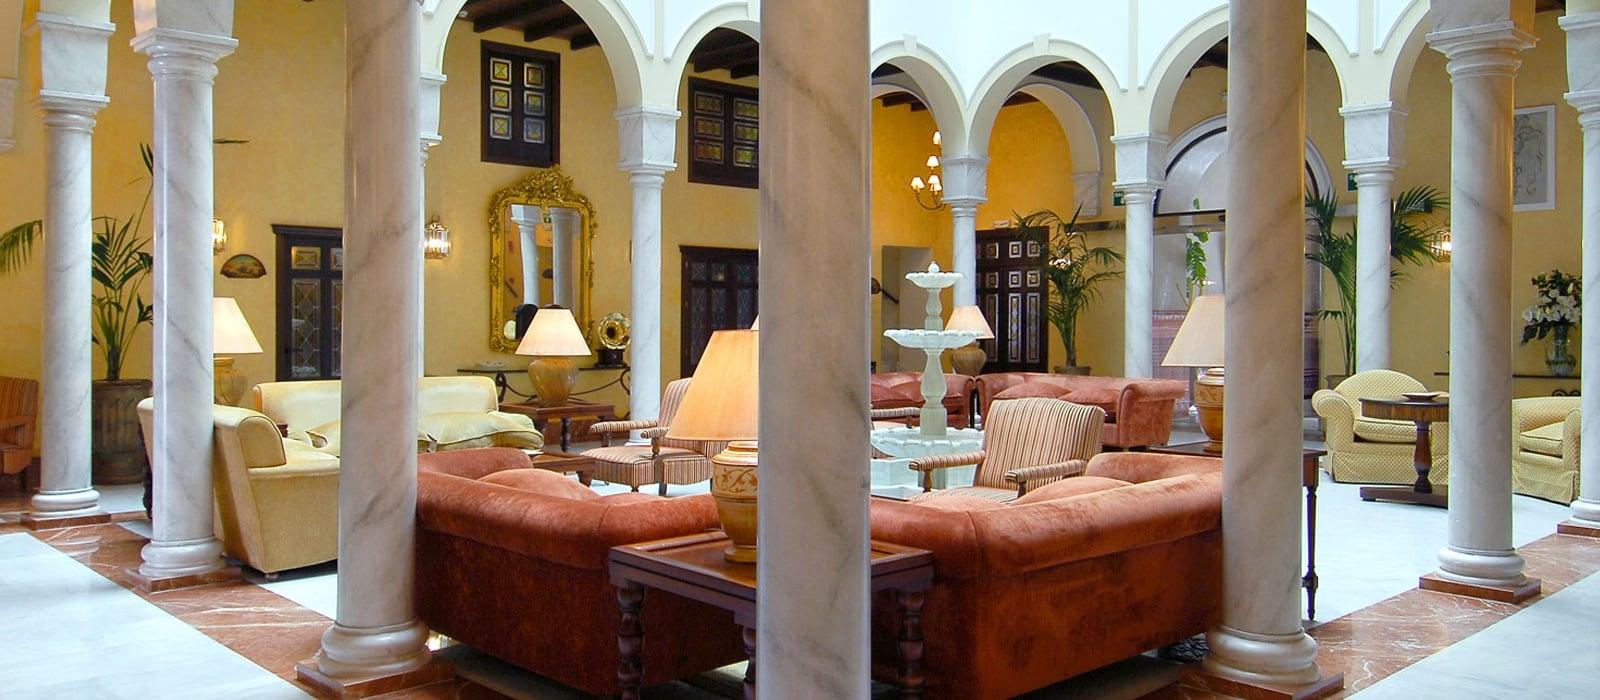 Marvelous Services Hotel Sevilla La Rábida   Vincci Hotels   Patio Andaluz